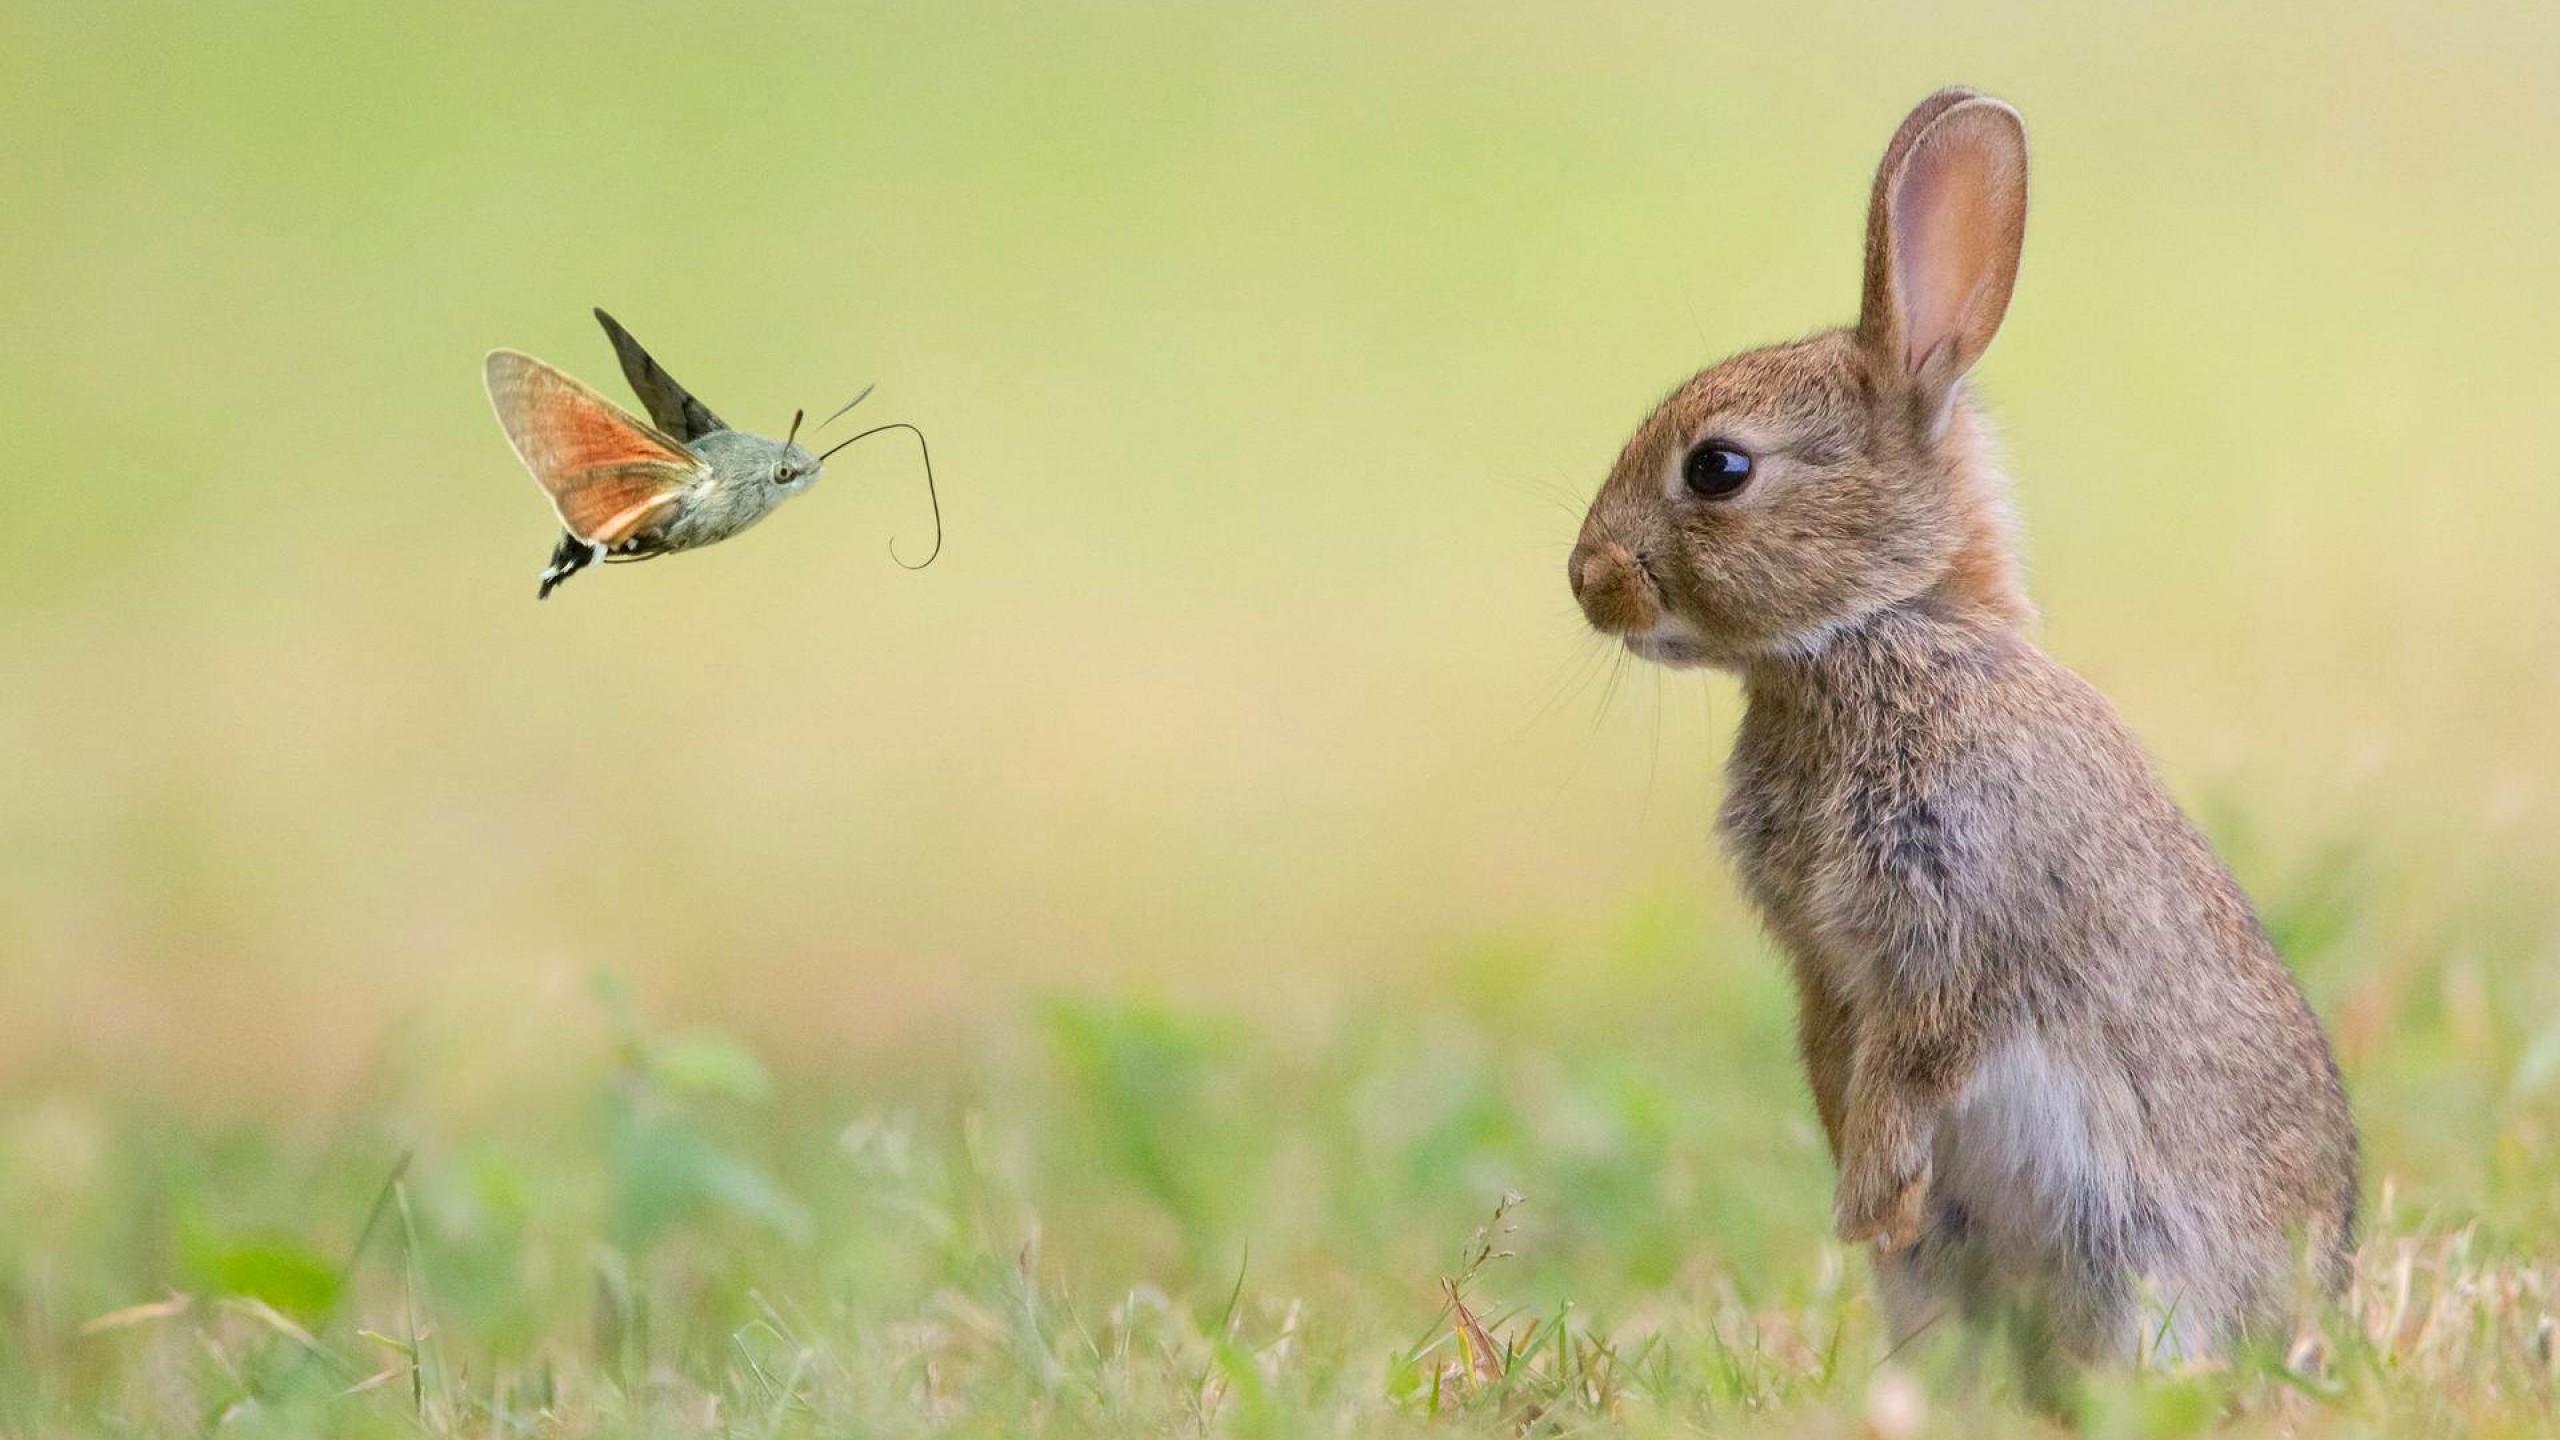 Wallpaper rabbit, cute animals, butterfly, 4k, Animals #15980